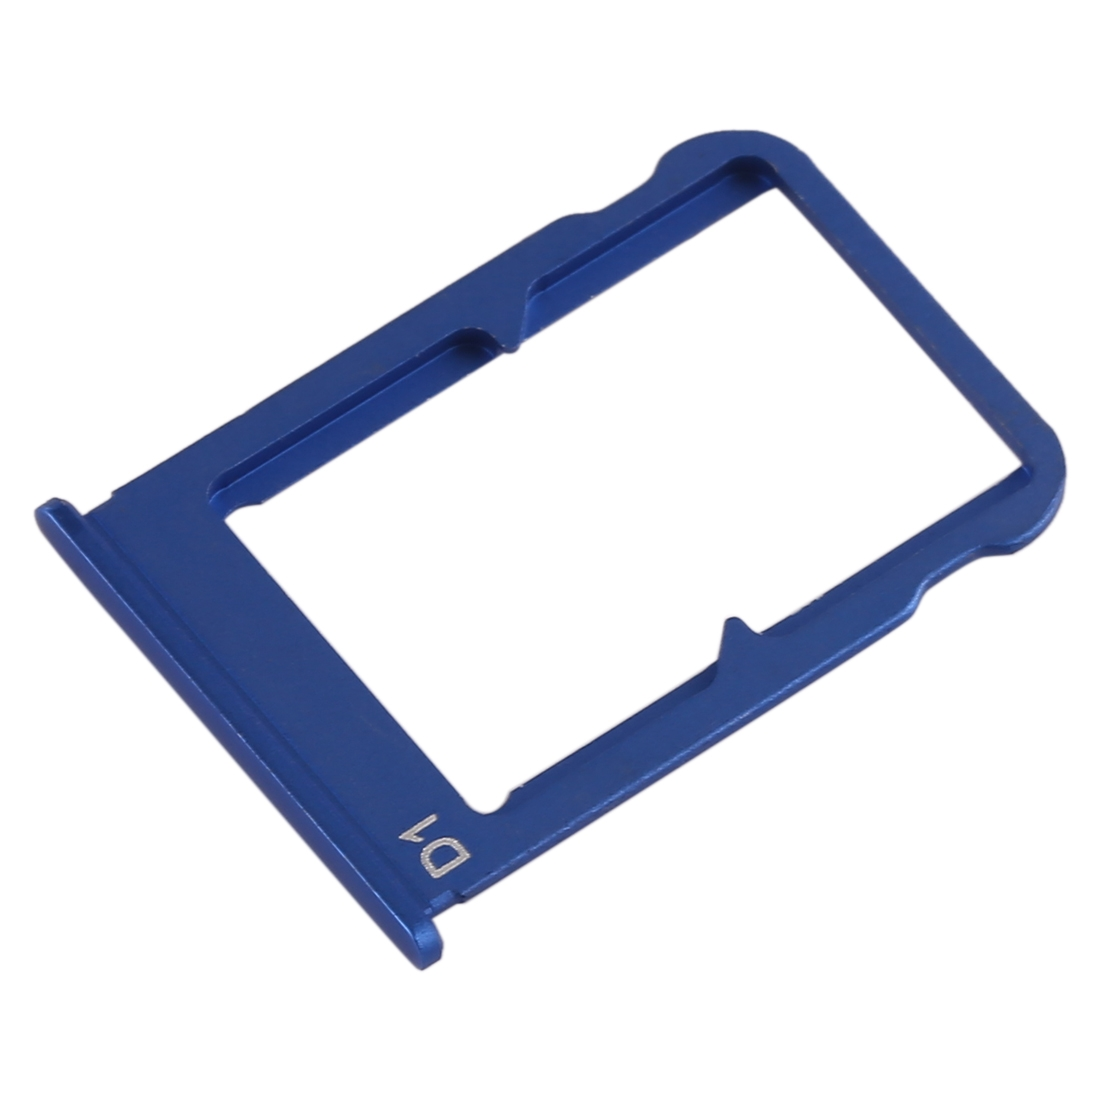 Bandeja de tarjeta SIM para Xiaomi Mi Mix 3 - Azul